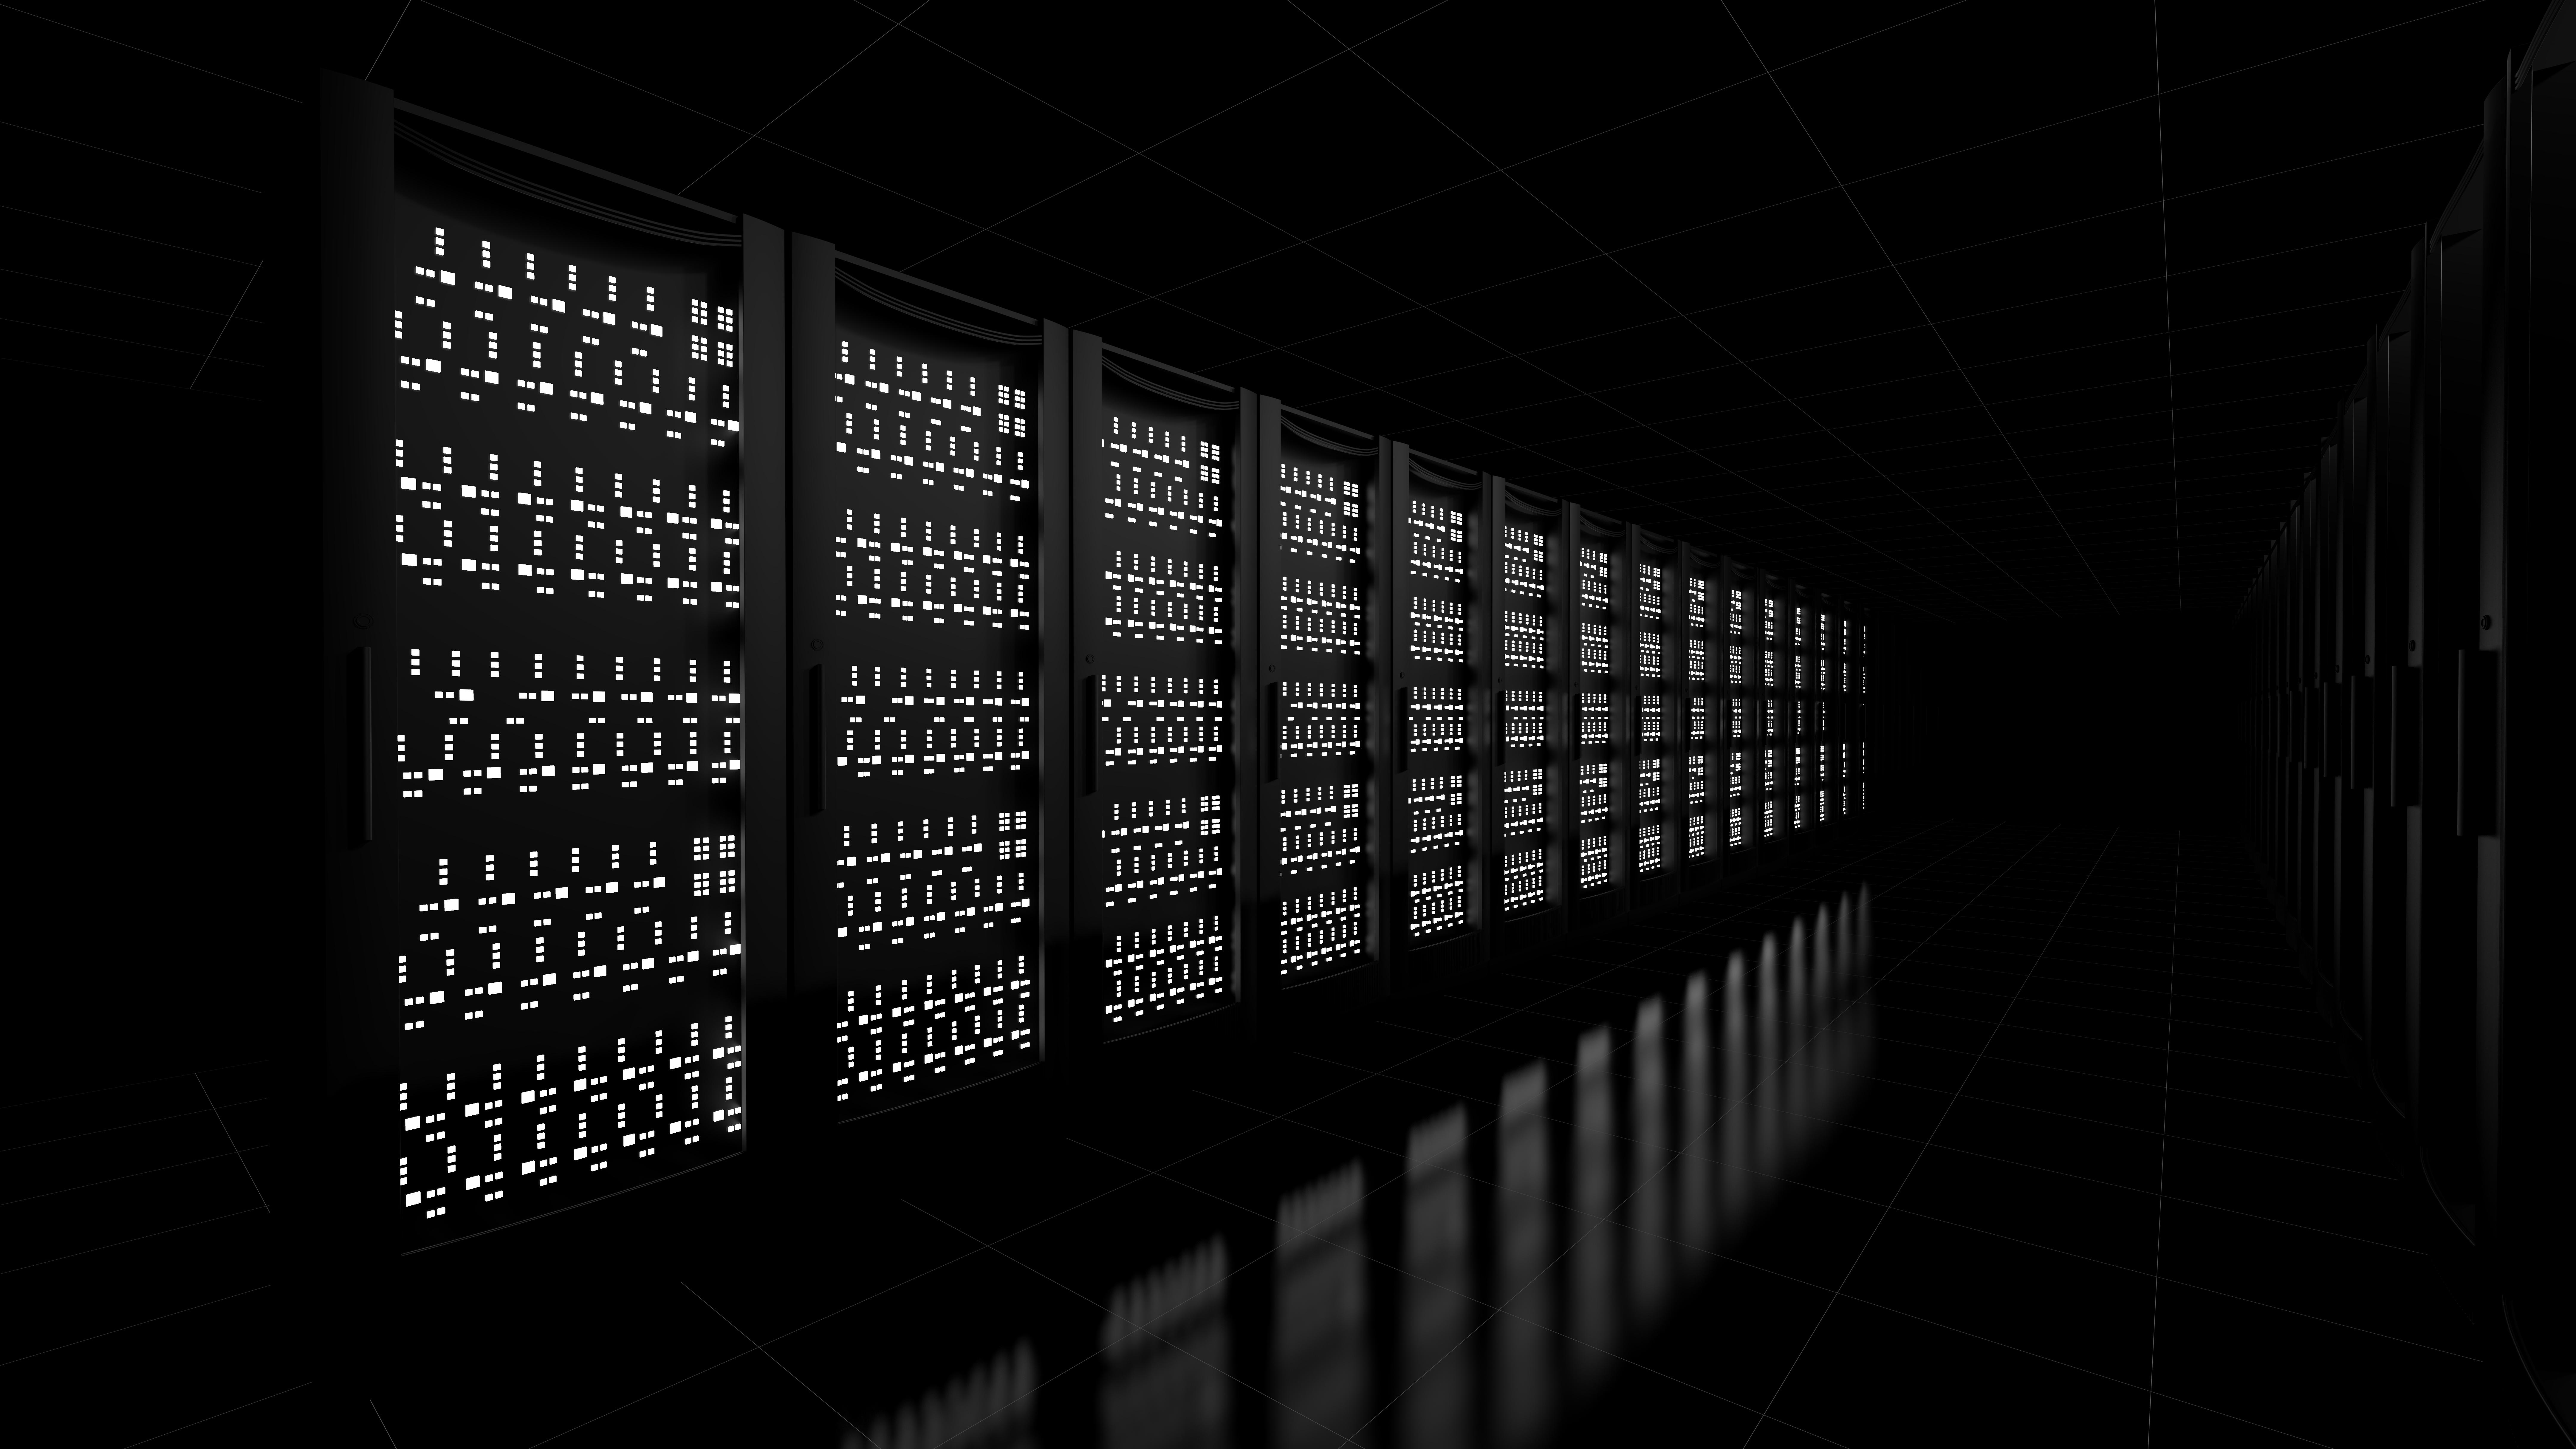 Network workstation servers on dark background